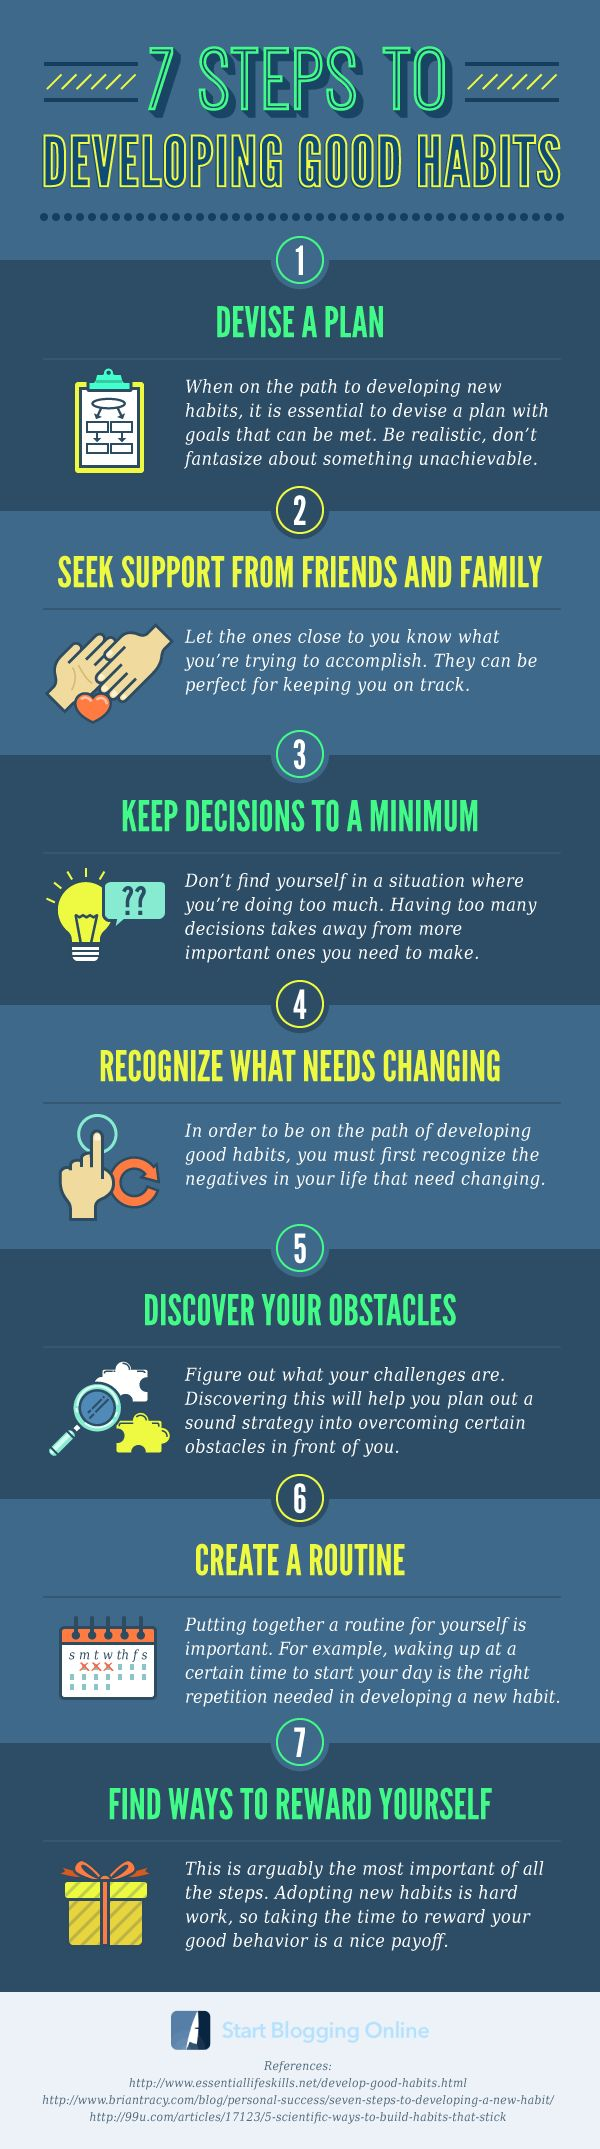 7 Steps to Developing Good Habits   Habit Change   Habit  Self Help   Self Improvement   Personal Development